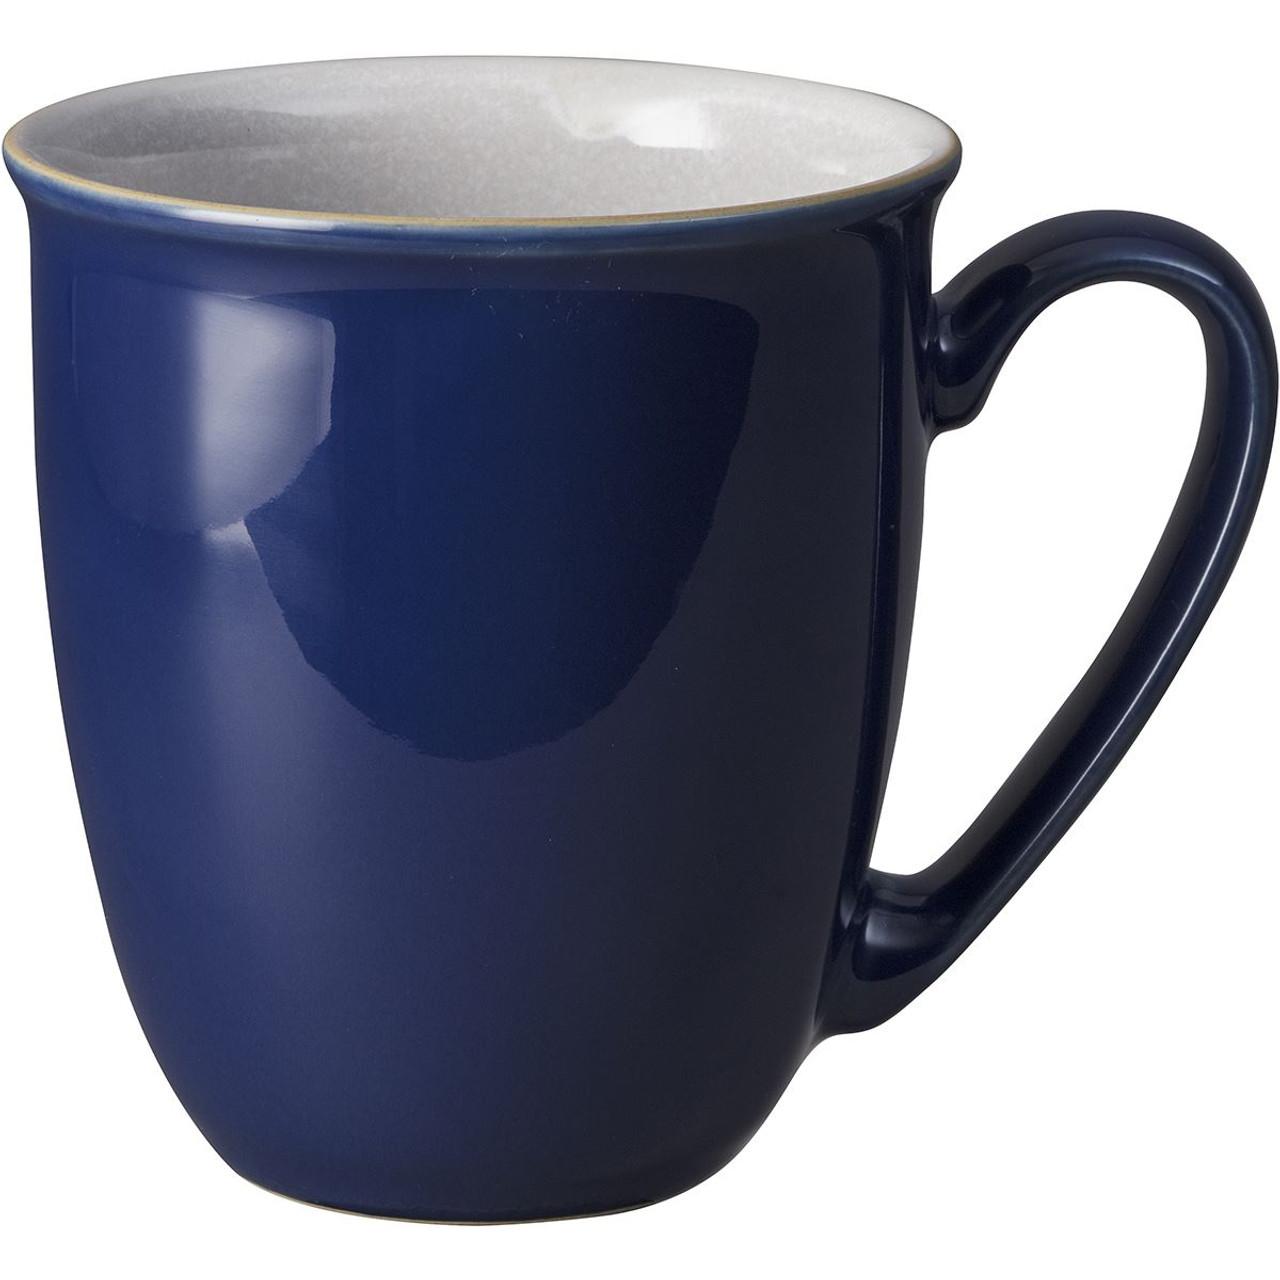 Denby Elements Coffee Beaker Mug in Dark Blue